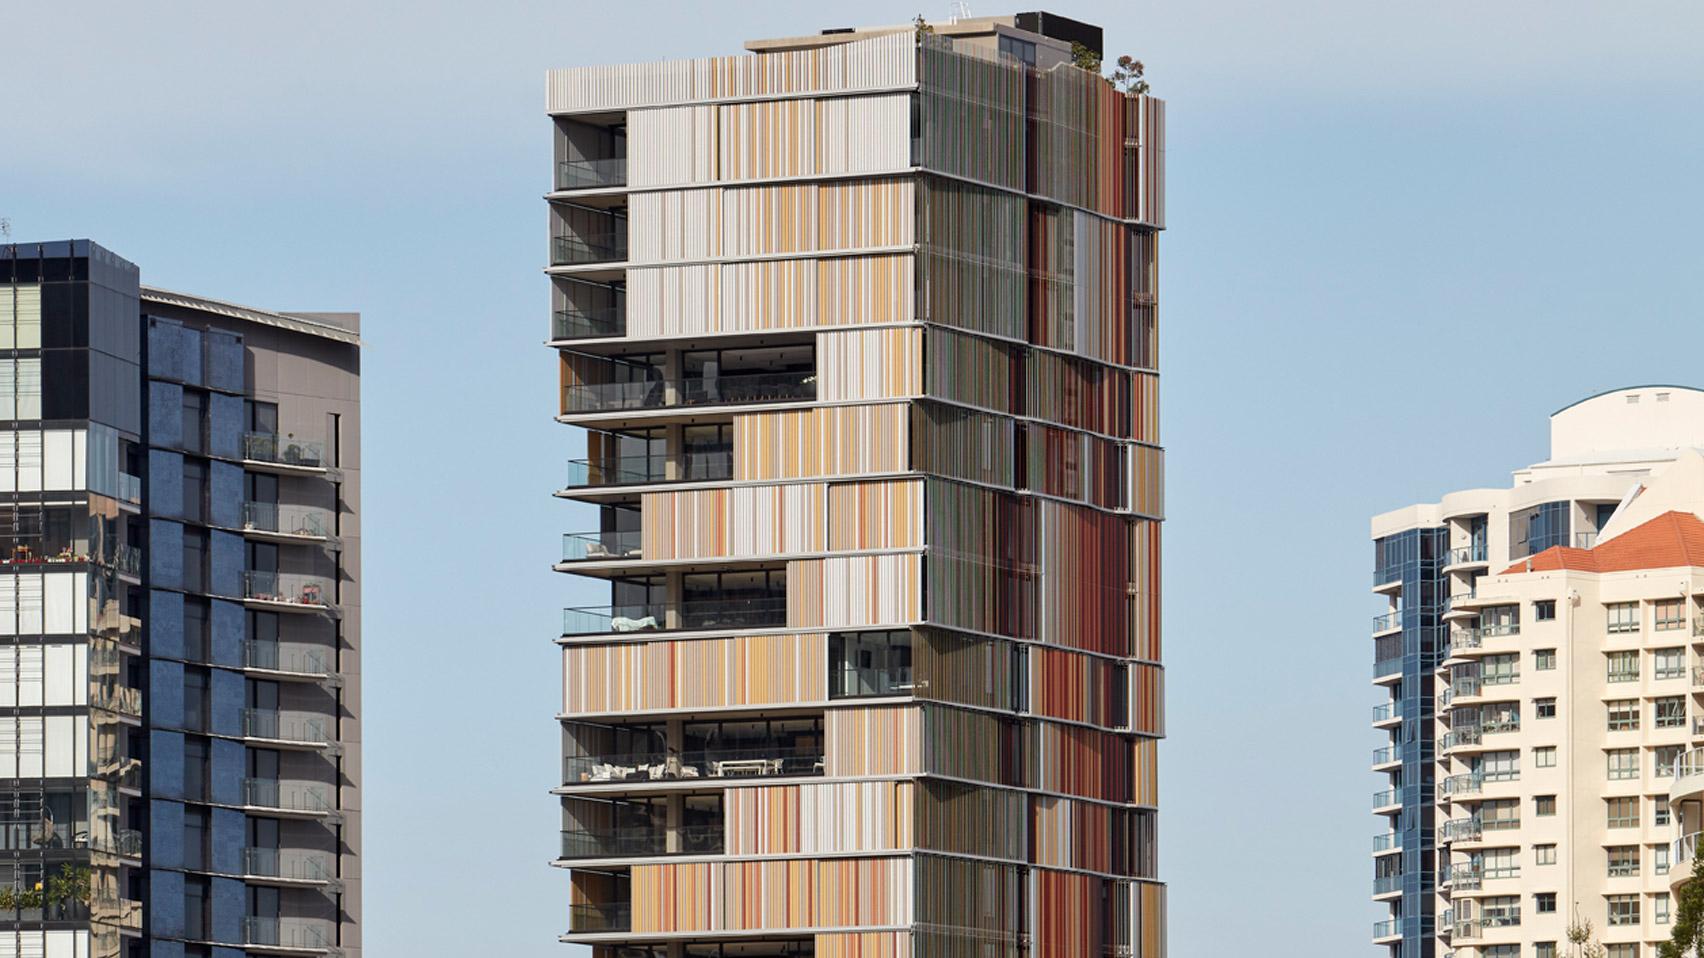 Bureau proberts wraps walan residential tower in brisbane in a